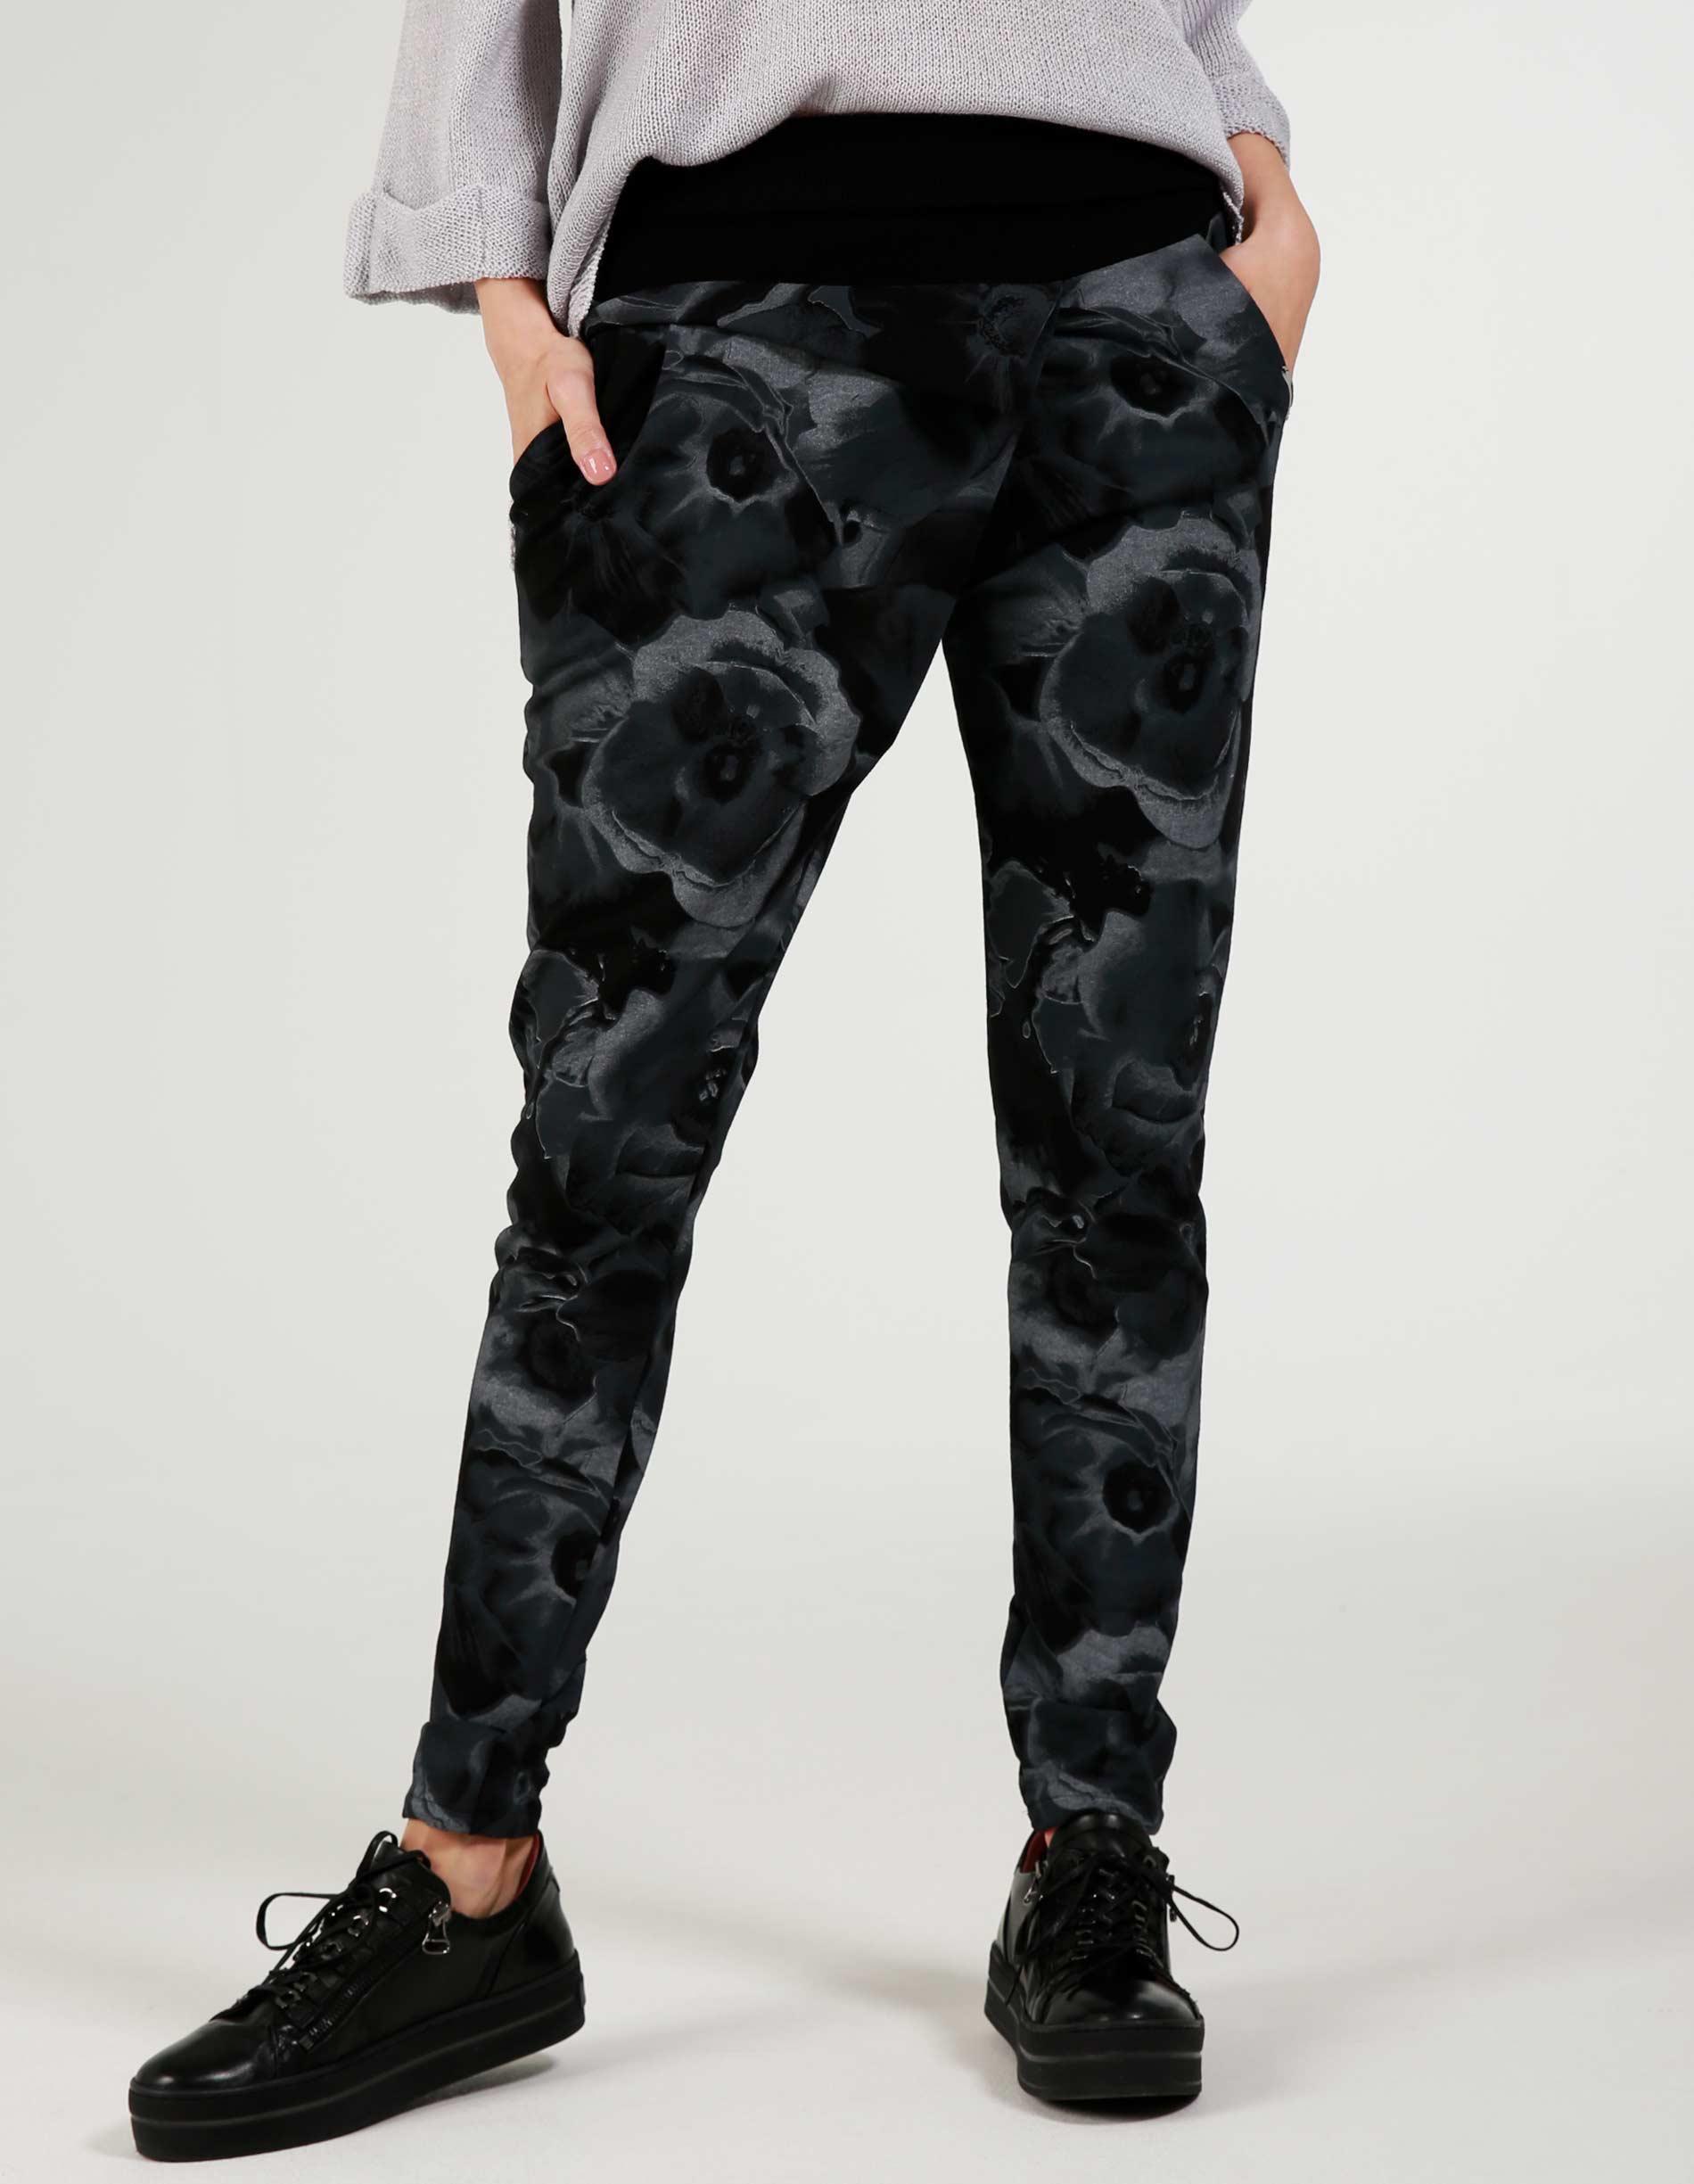 Spodnie - 30-64084A NER - Unisono